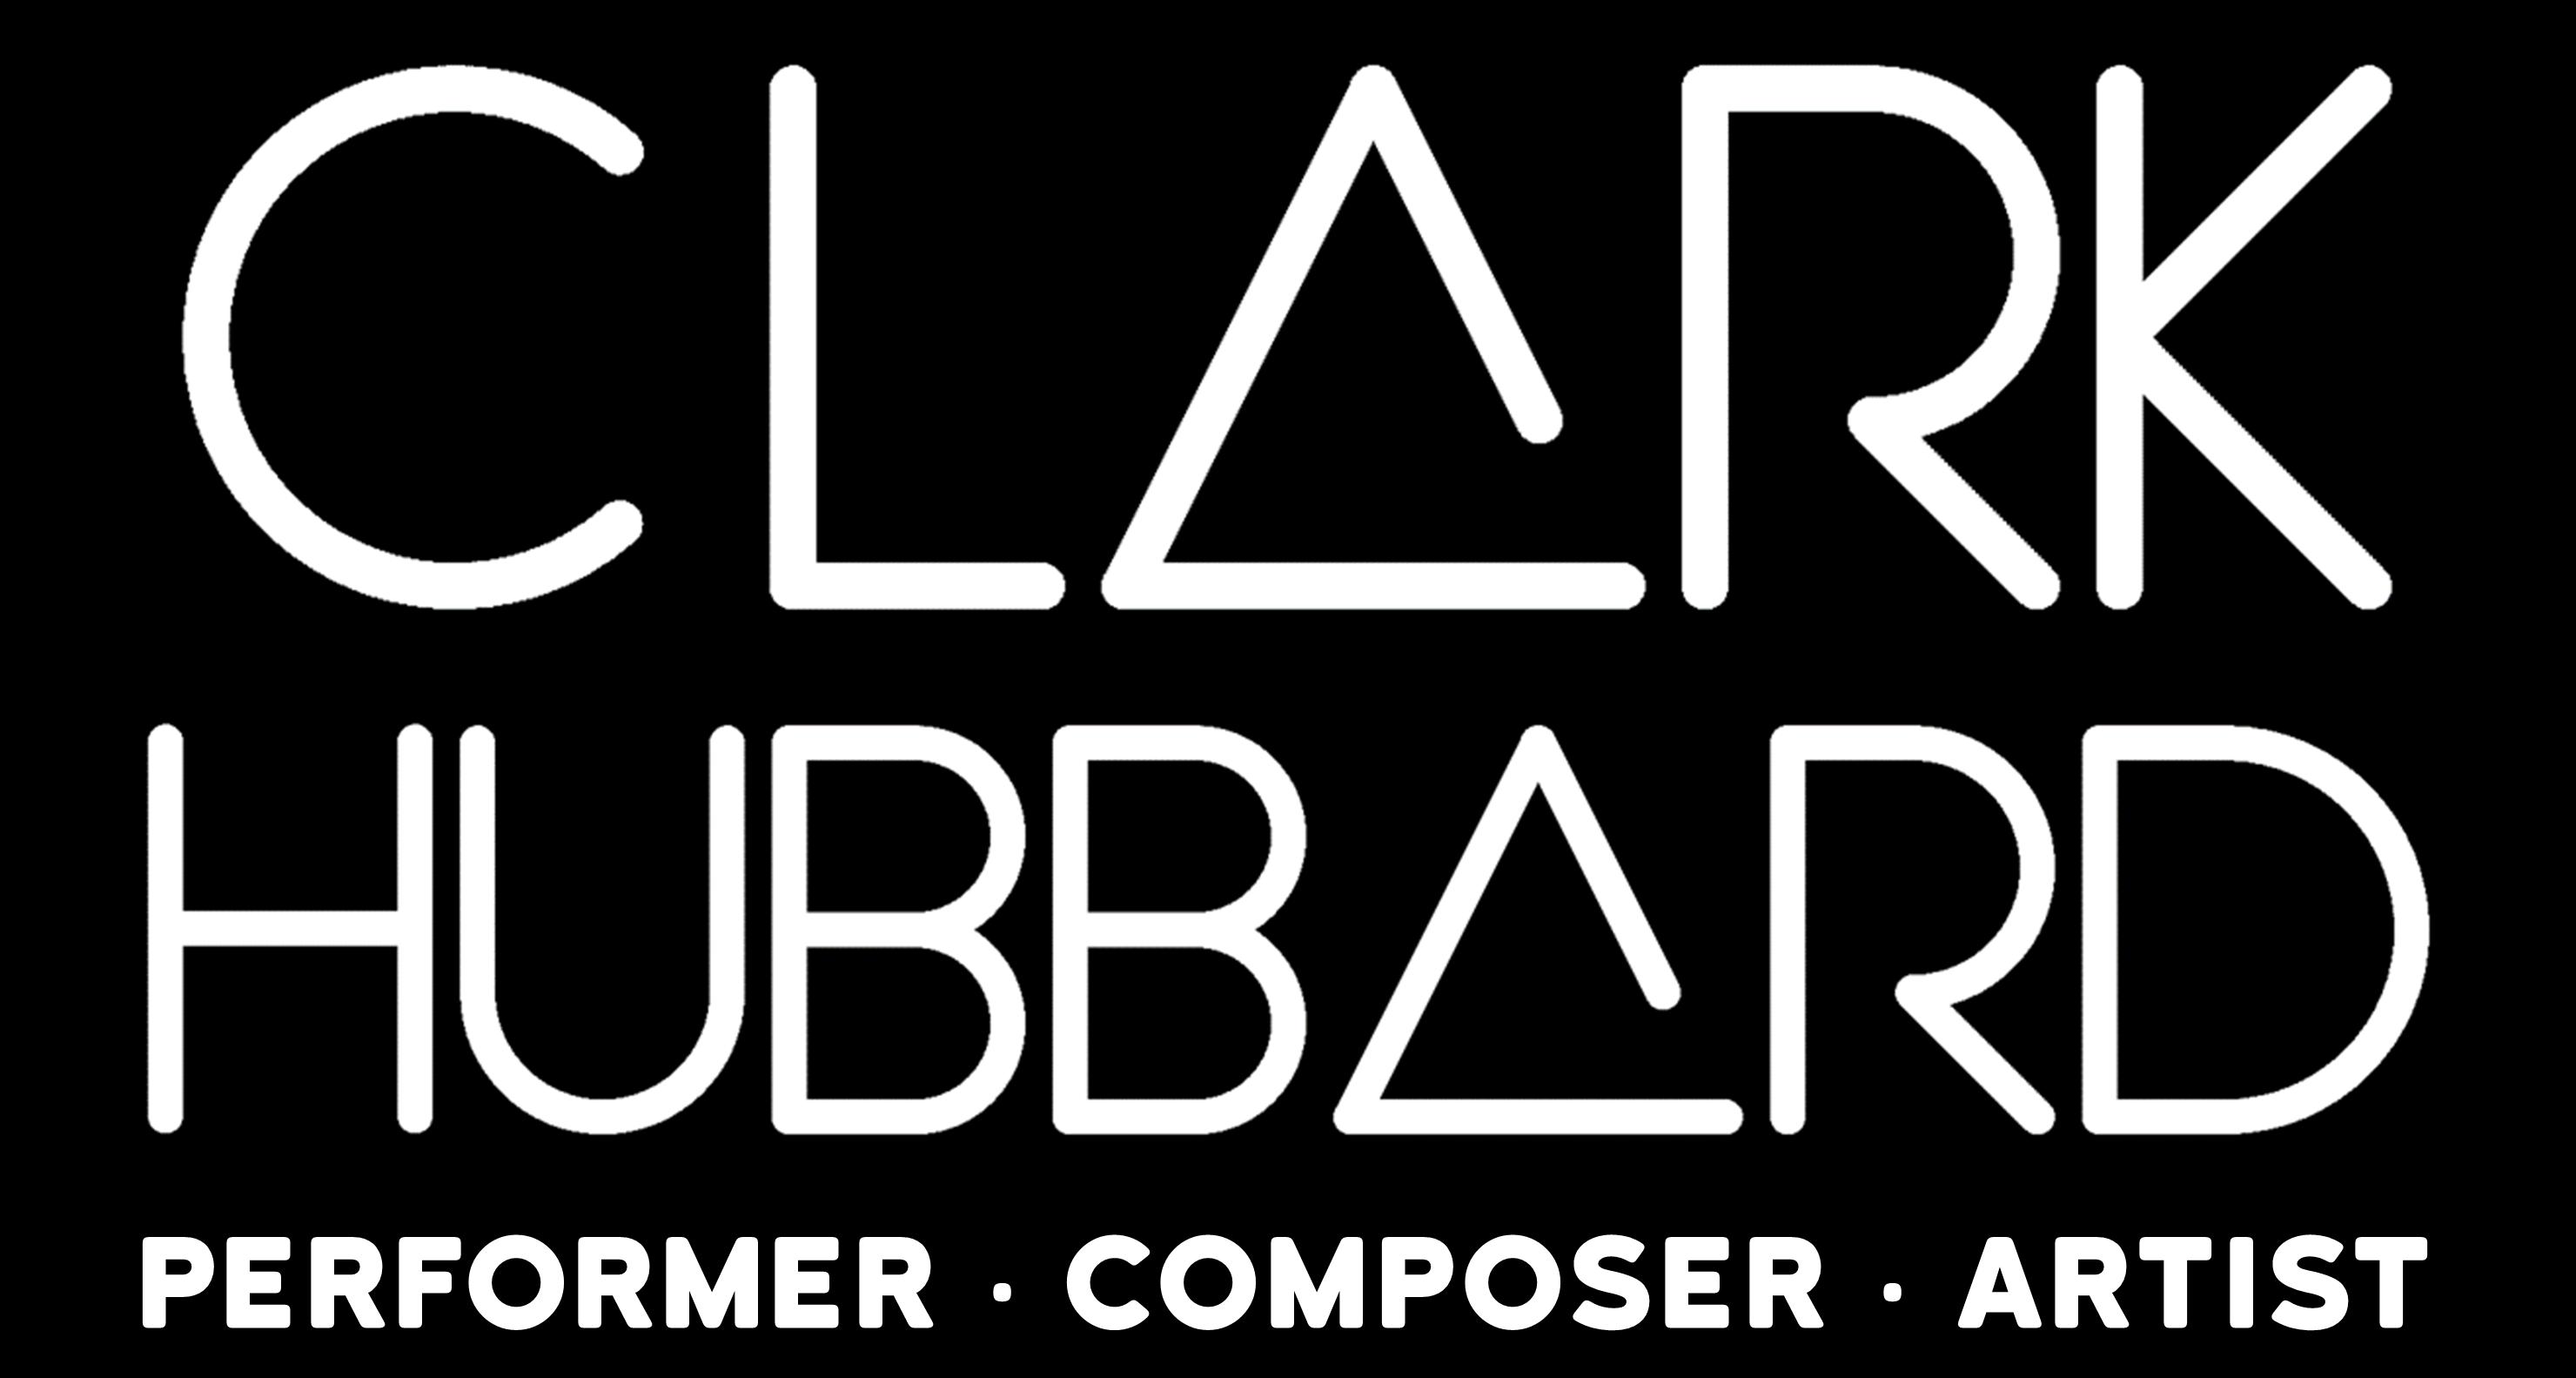 Clark Hubbard Music